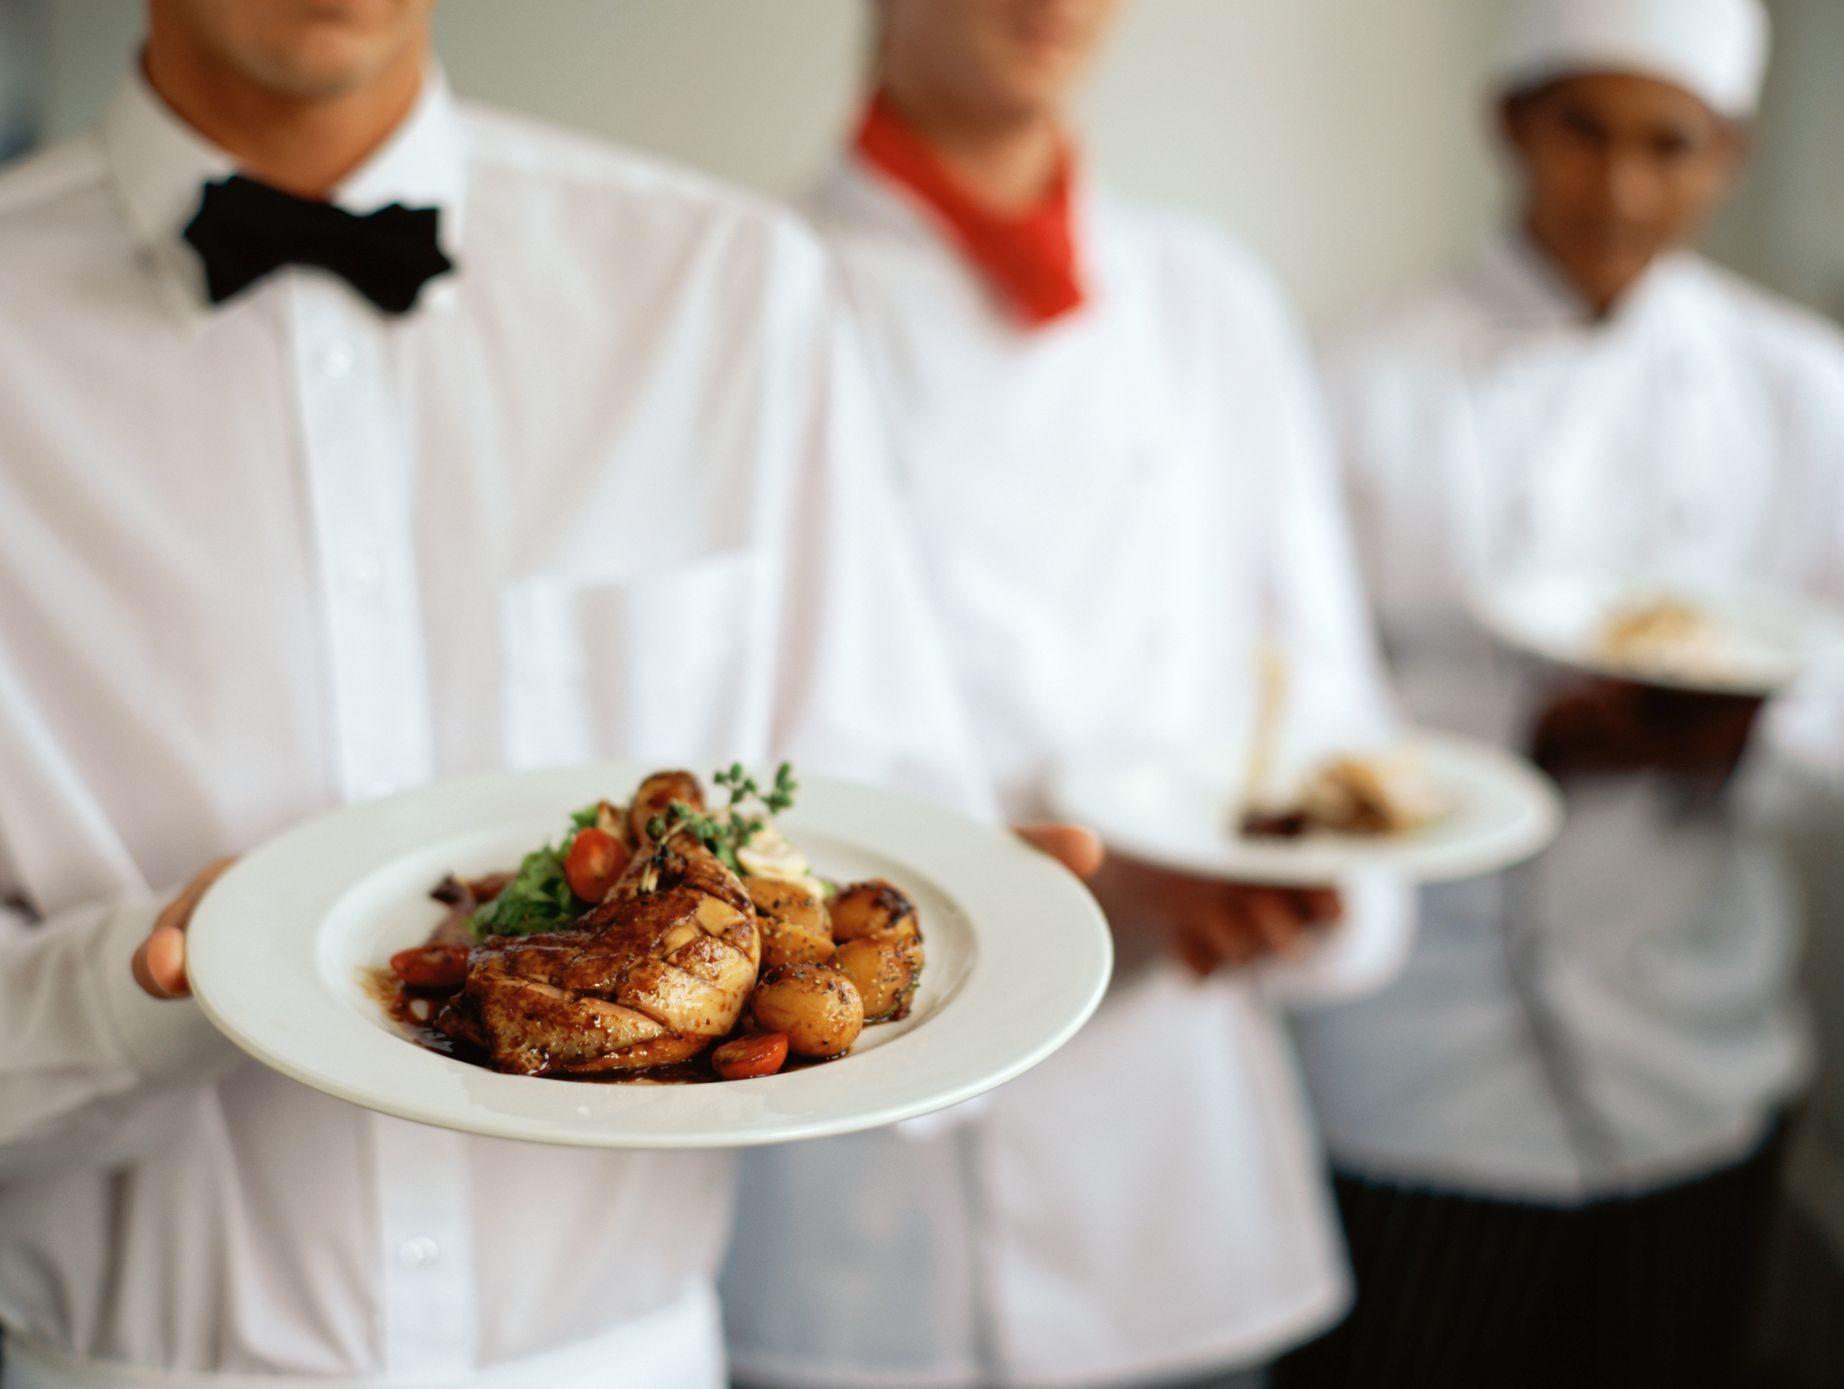 презентация в картинках про ресторан недели